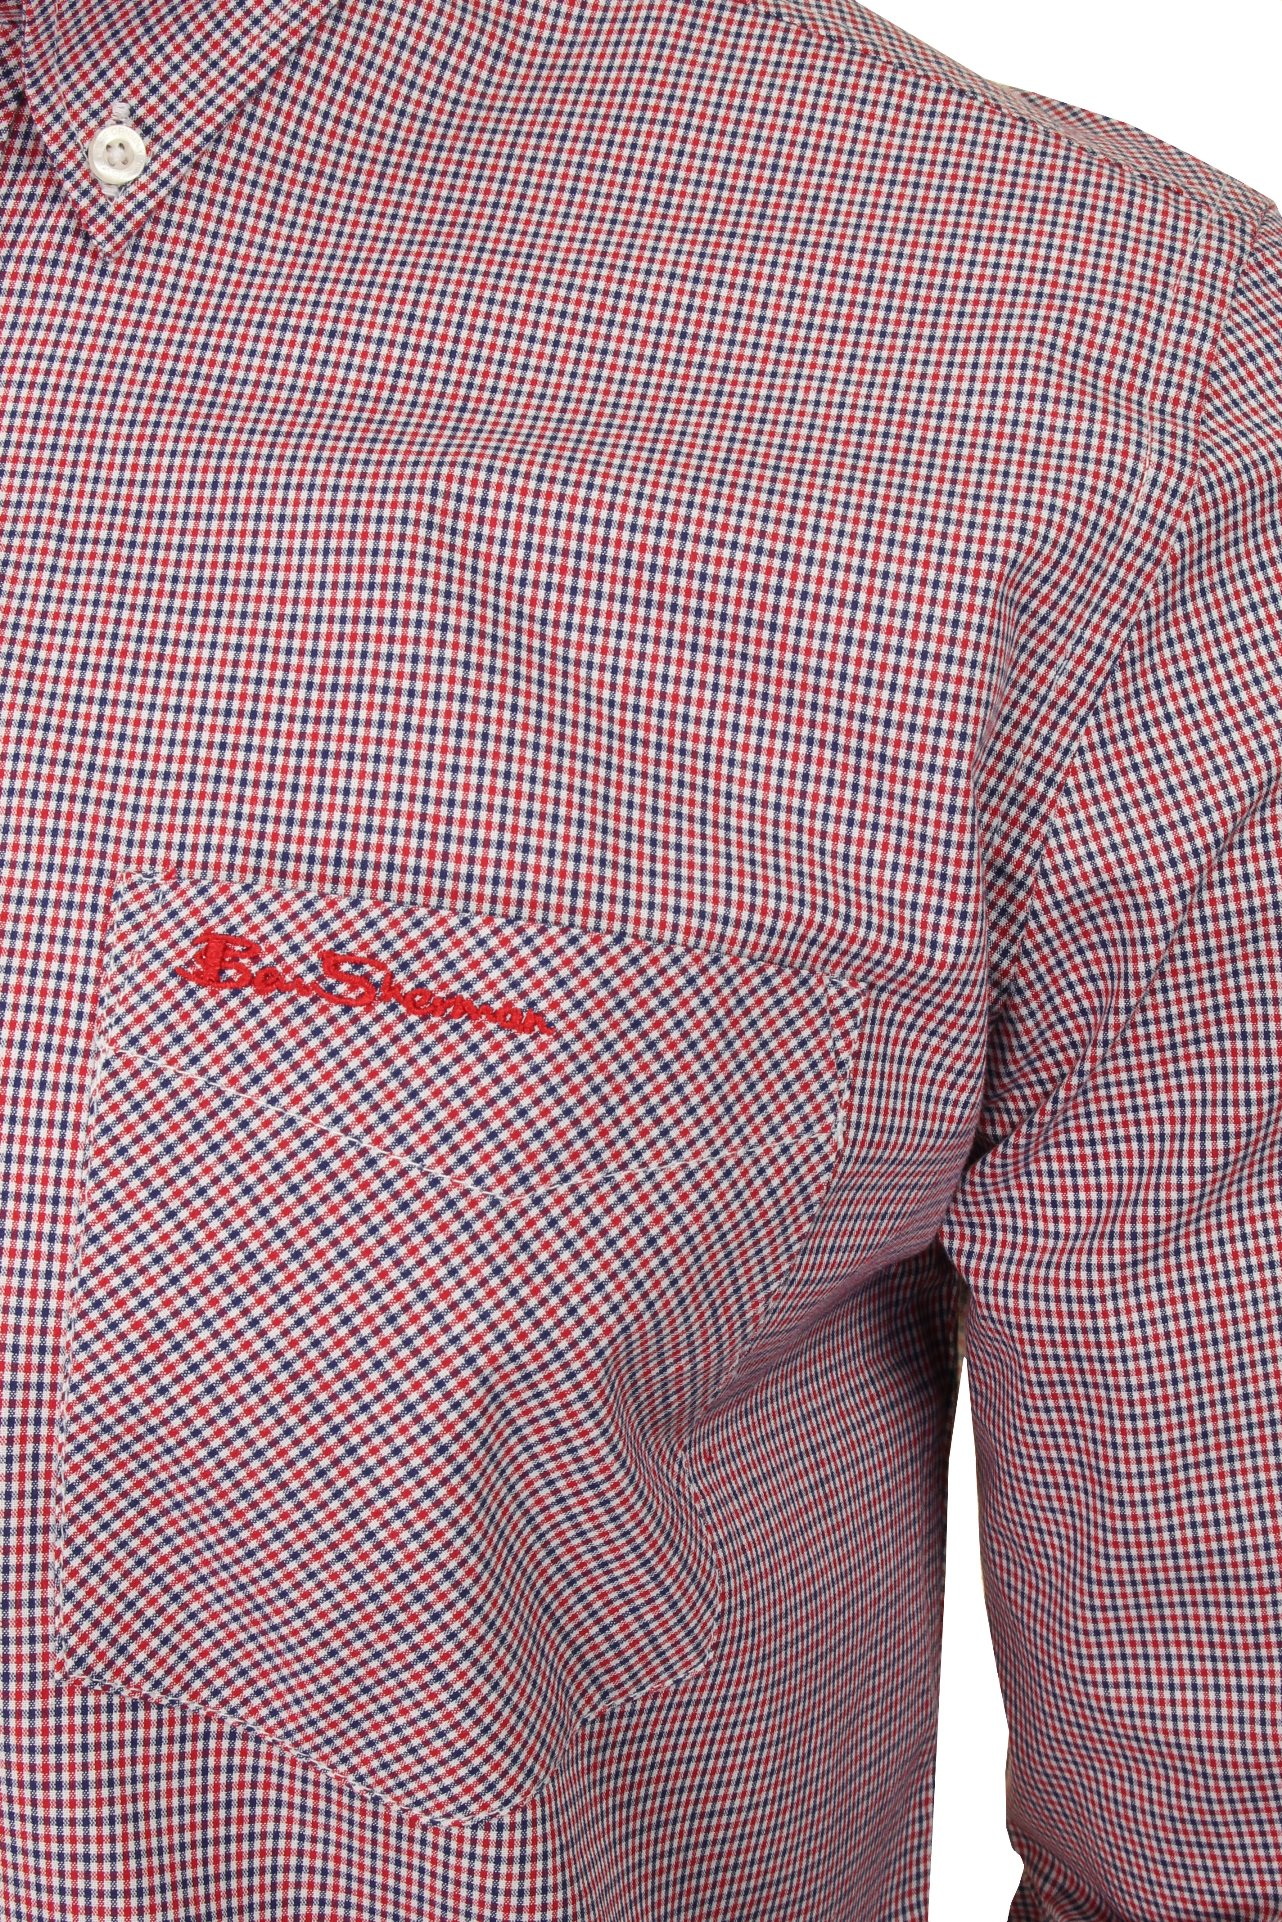 Ben-Sherman-Men-039-s-Long-Sleeved-Gingham-Check-Shirt miniatuur 7